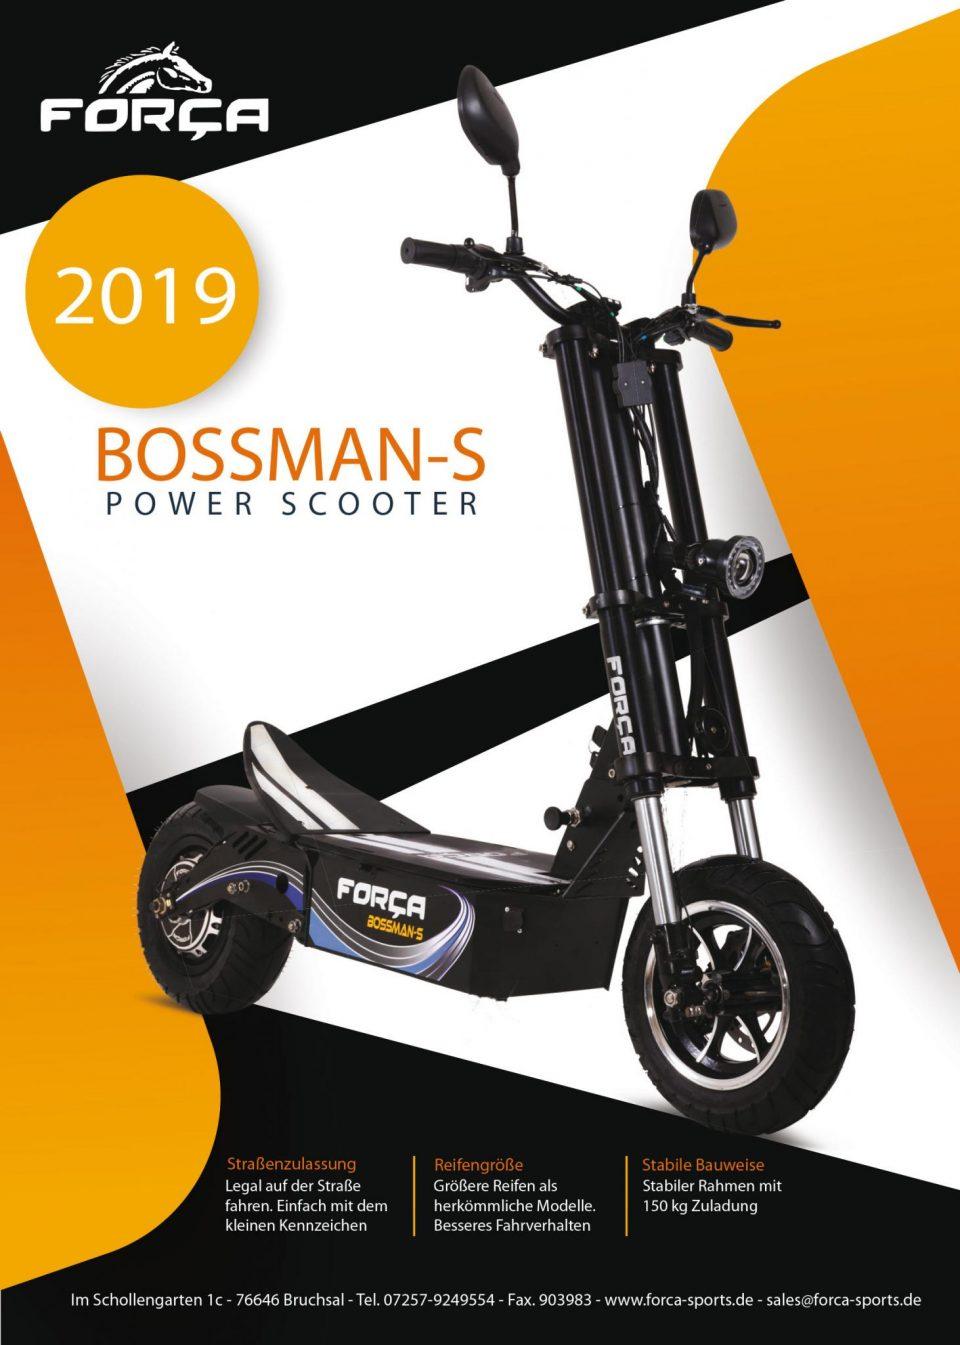 03 2019 Bossman S Flyer 1 960x1345 - Bossman-S II